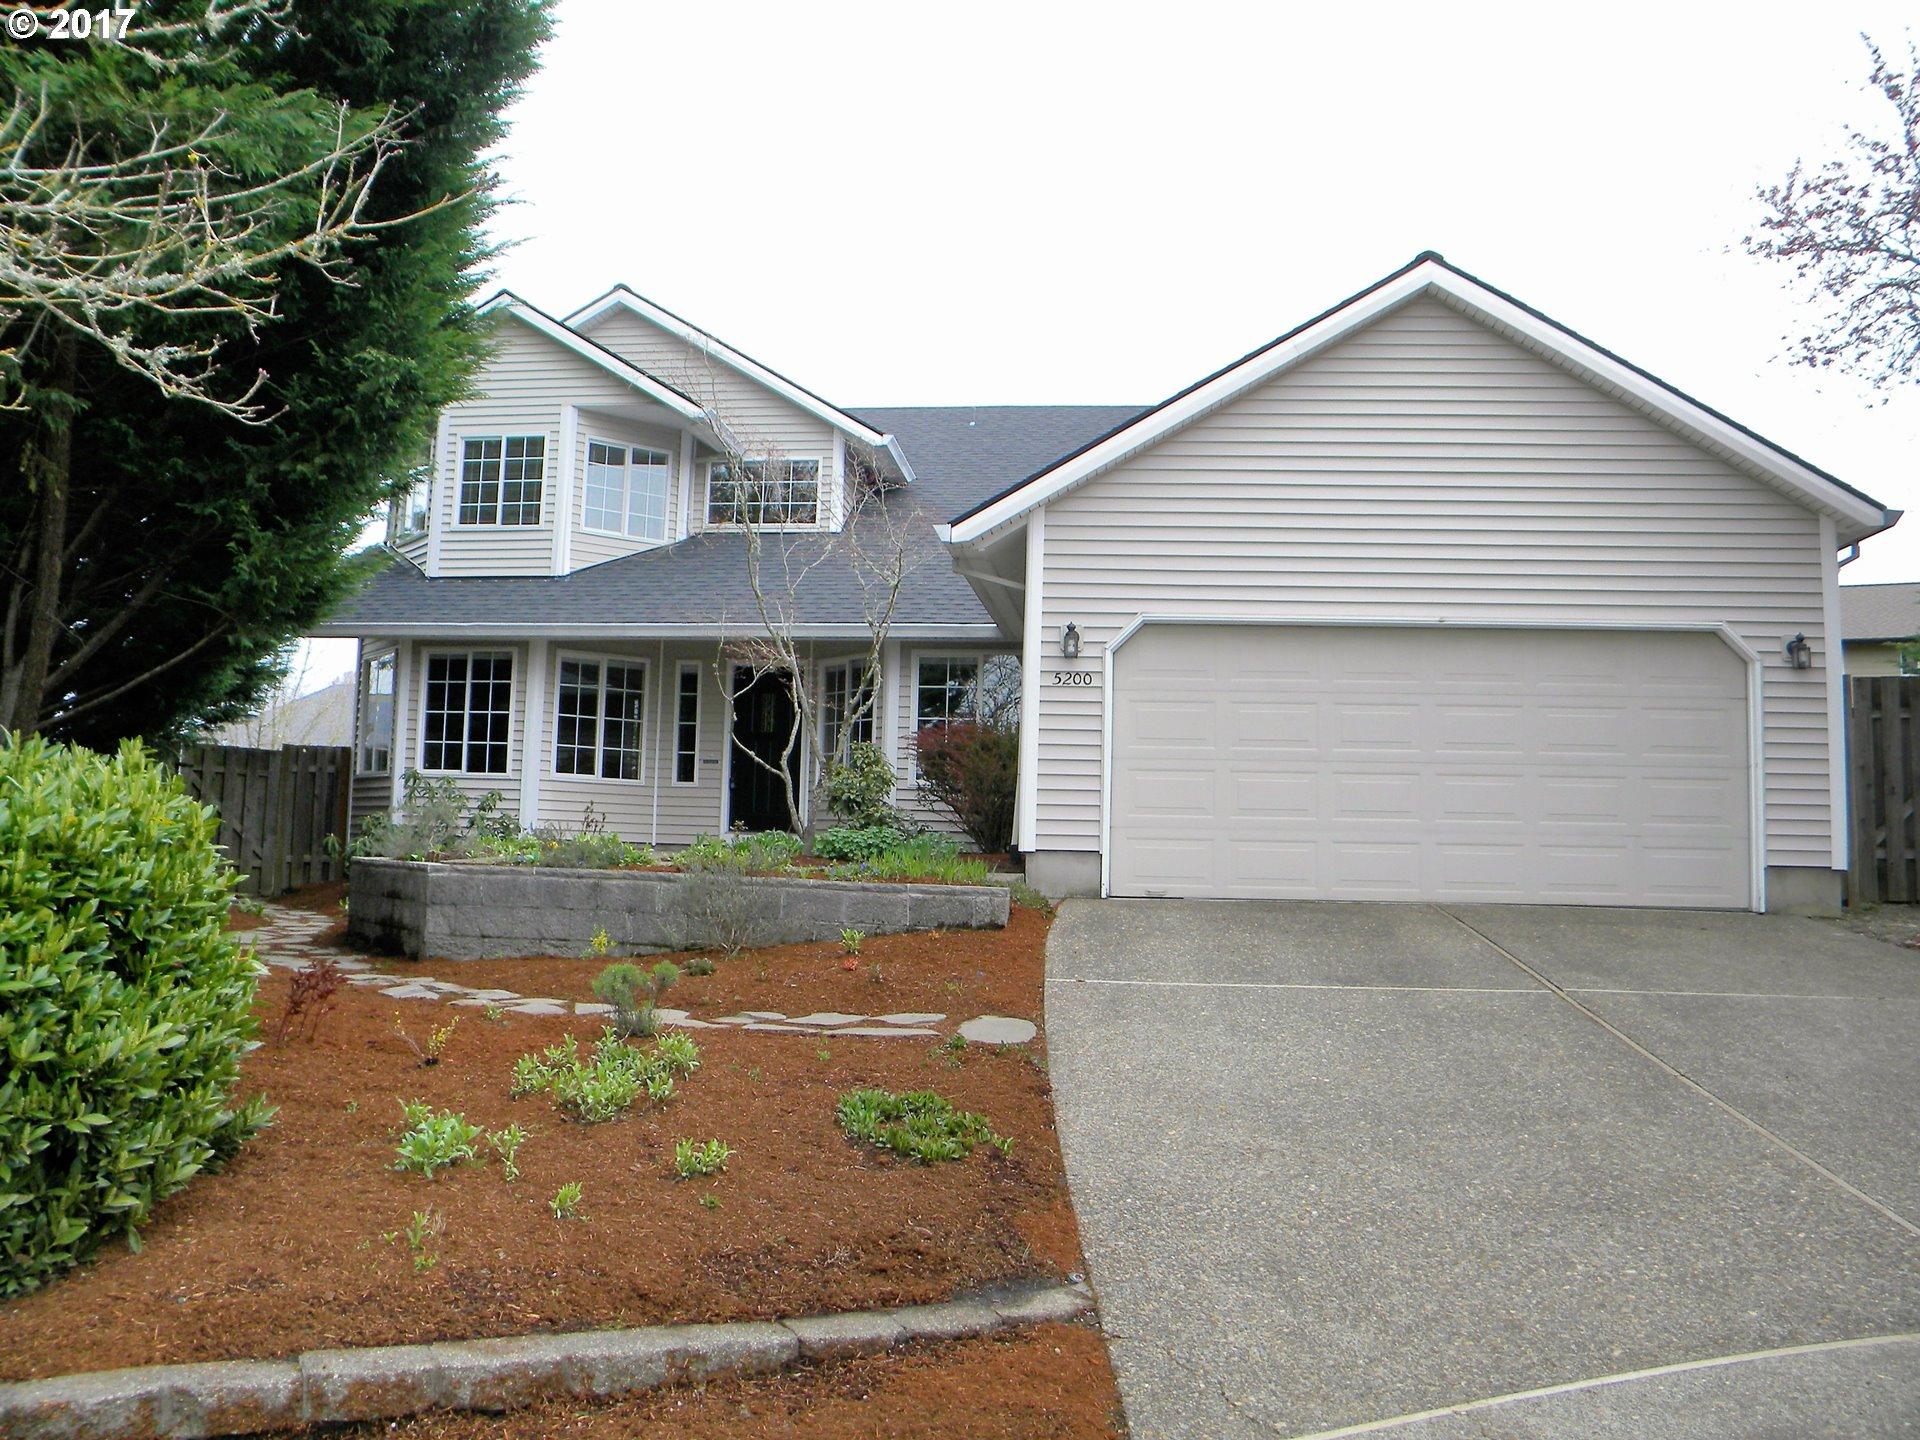 5200 NW 168TH PL, Portland OR 97229